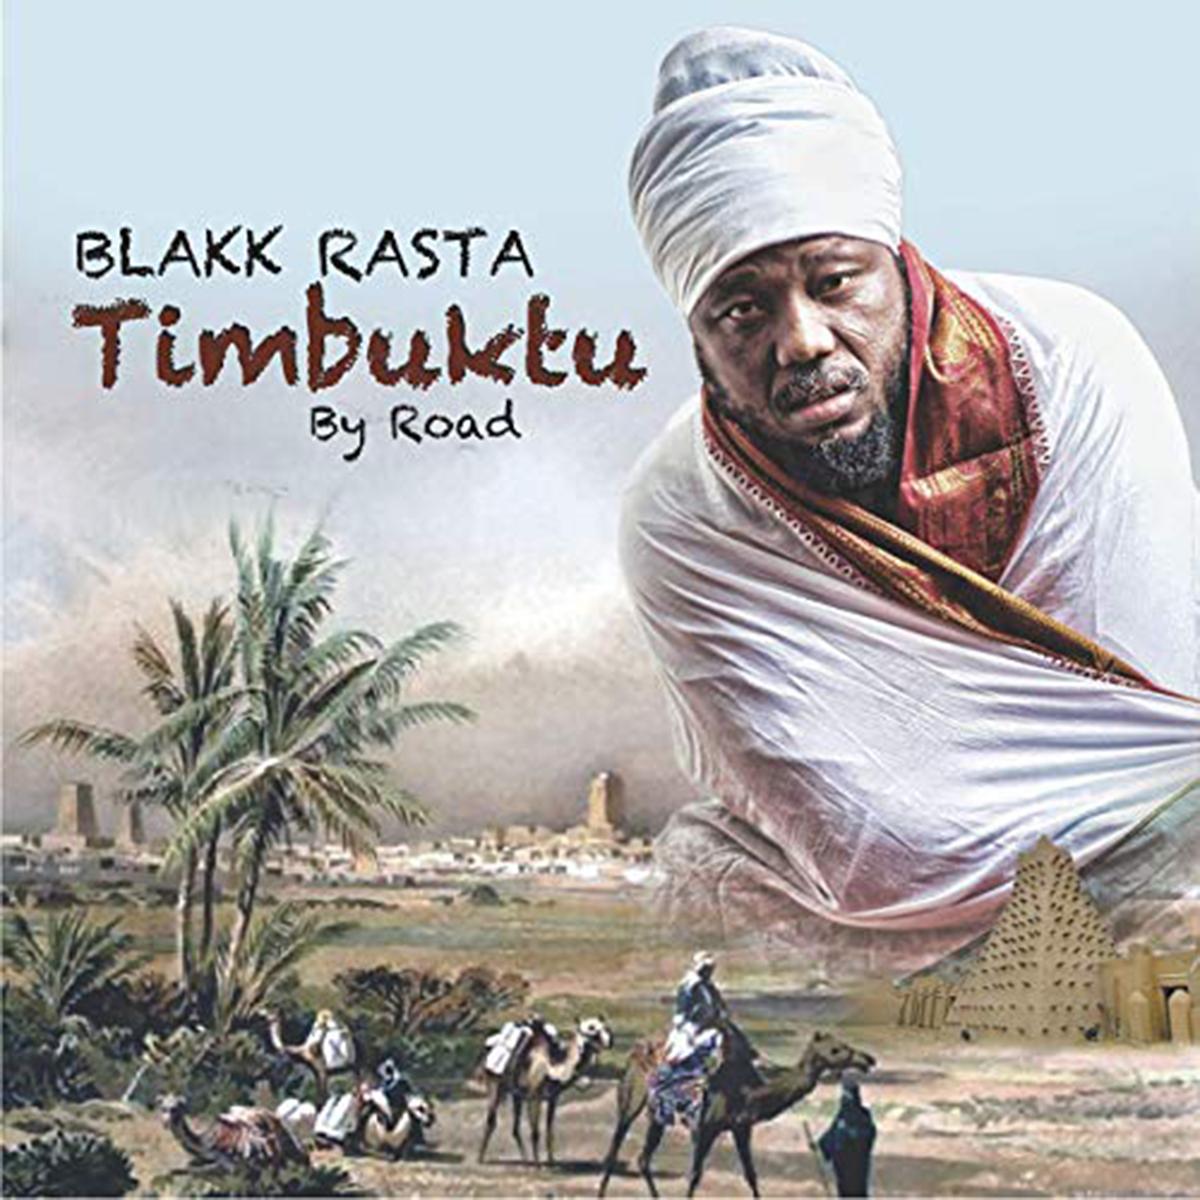 Timbuktu by Road by Blakk Rasta